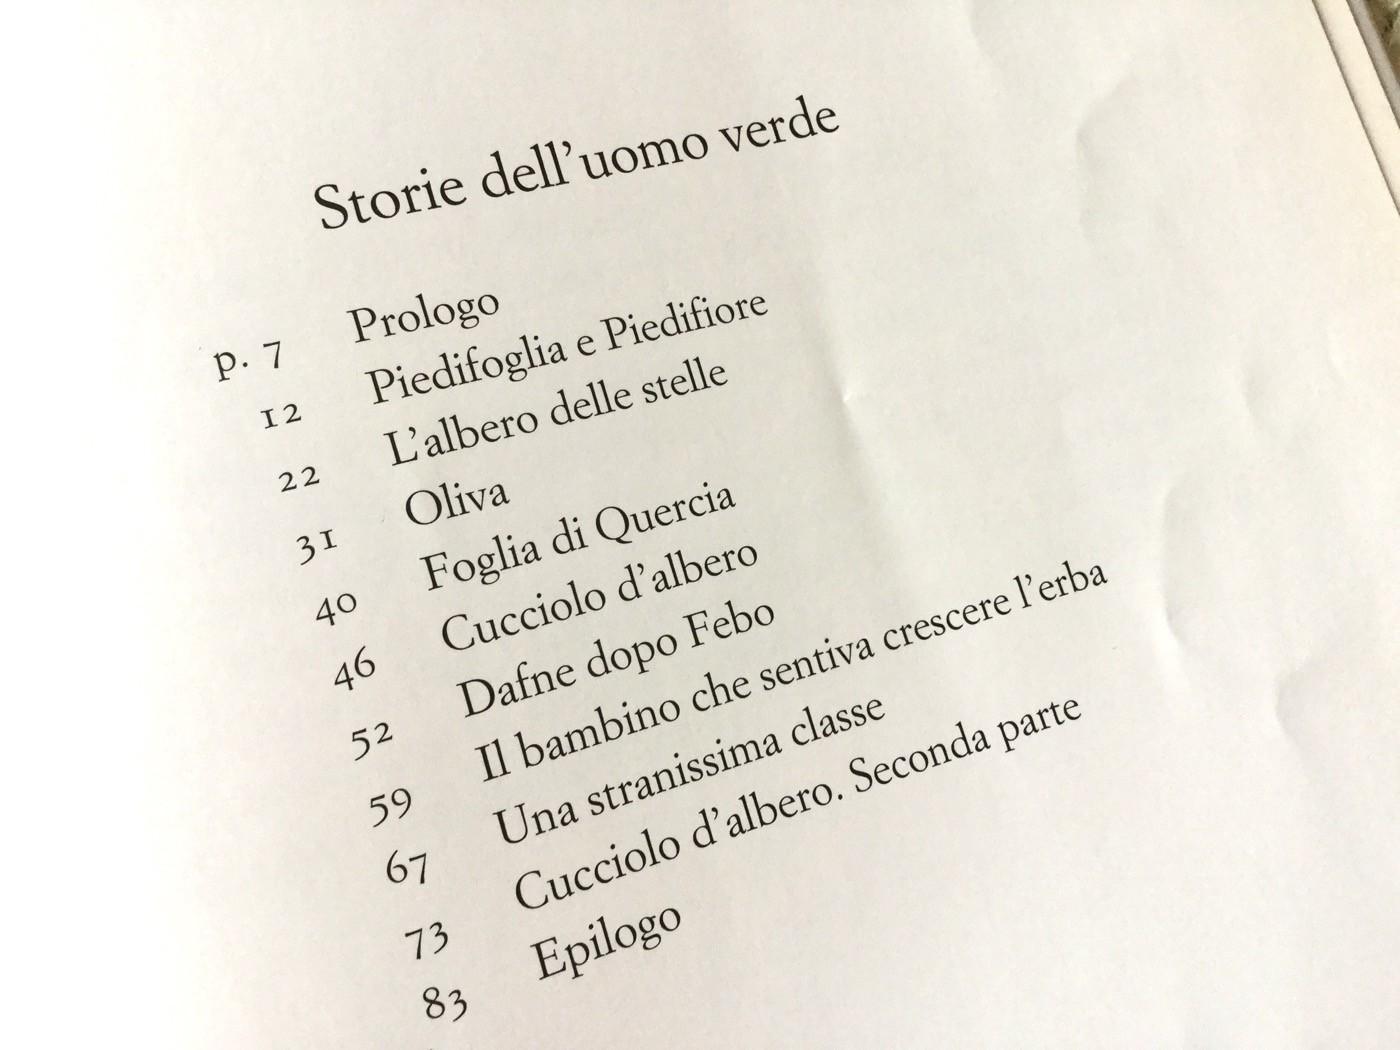 STORIE DELL'UOMO VERDE   BEATRICE MASINI - G. GAVIRAGHI - EINAUDI RAGAZZI - 2010